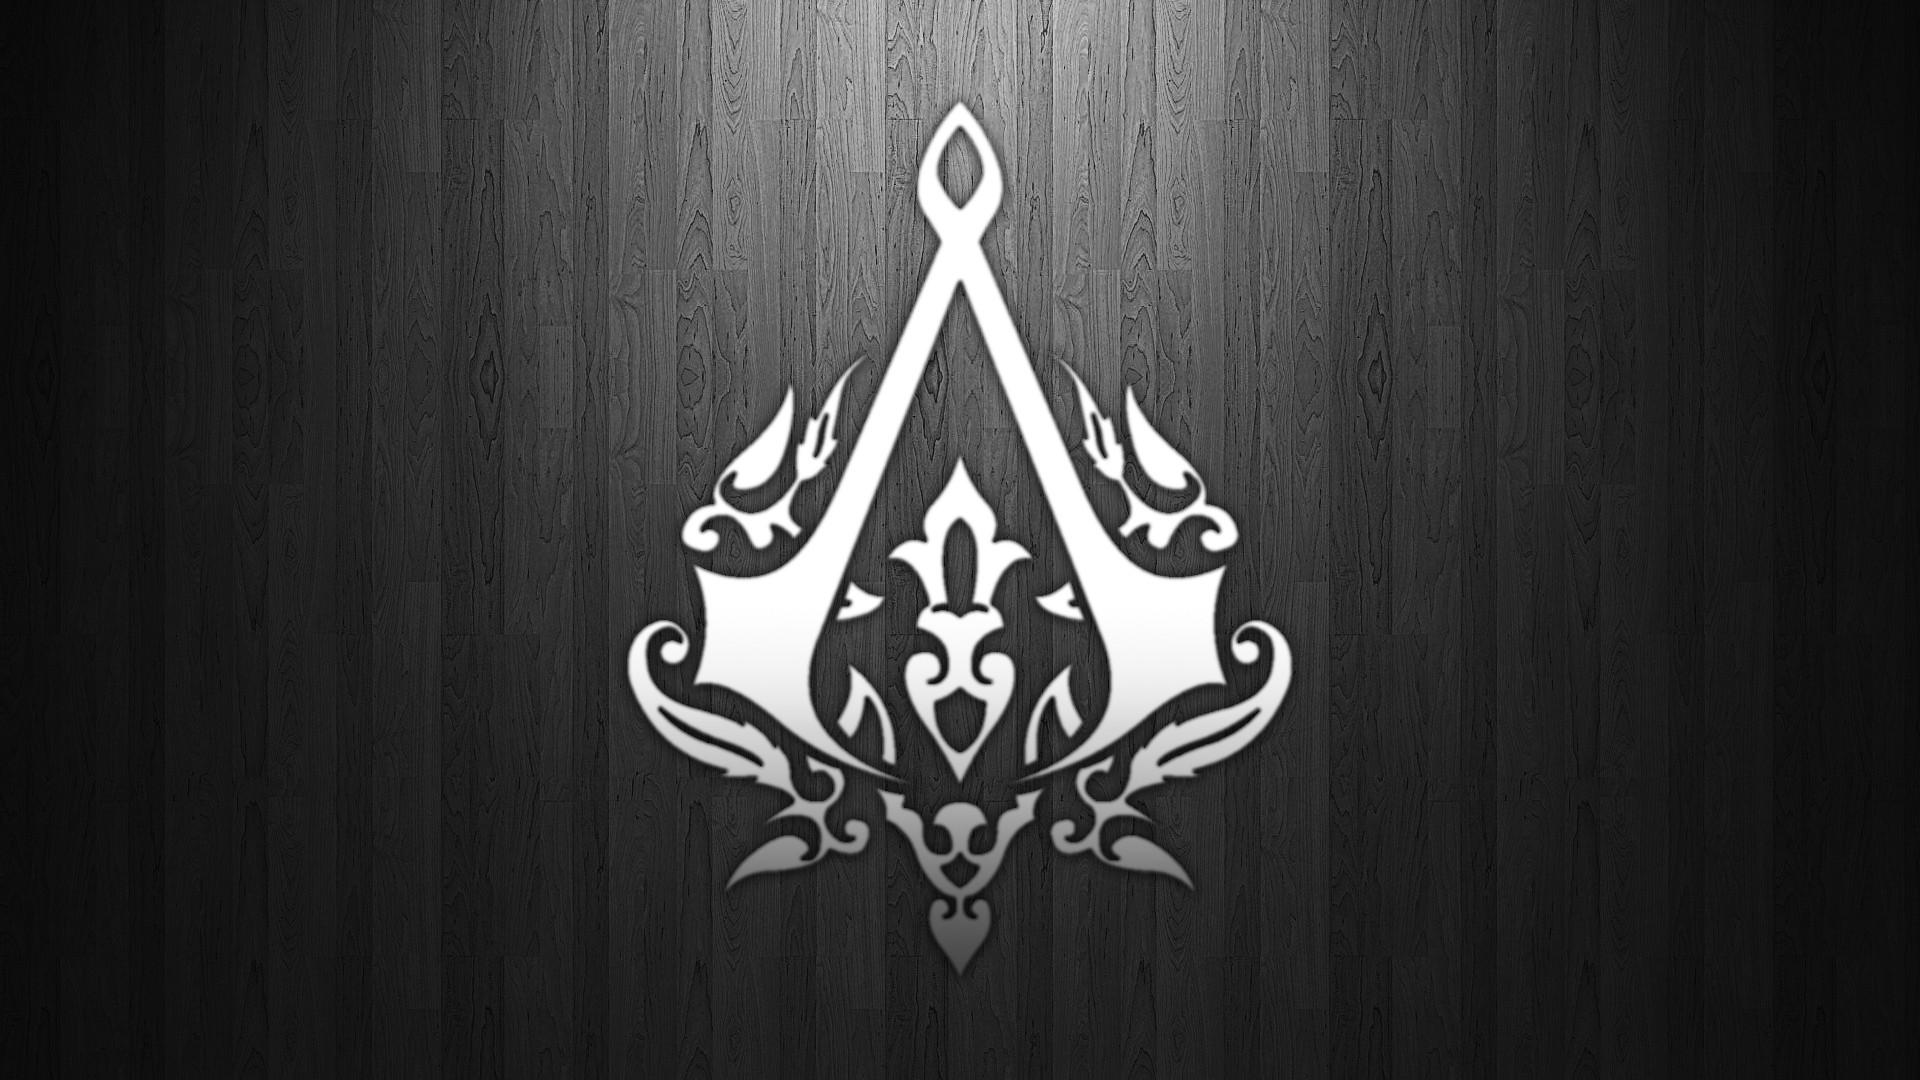 assassins creed hd wallpaper on Assassins Creed Wallpaper 1920x1080 1920x1080